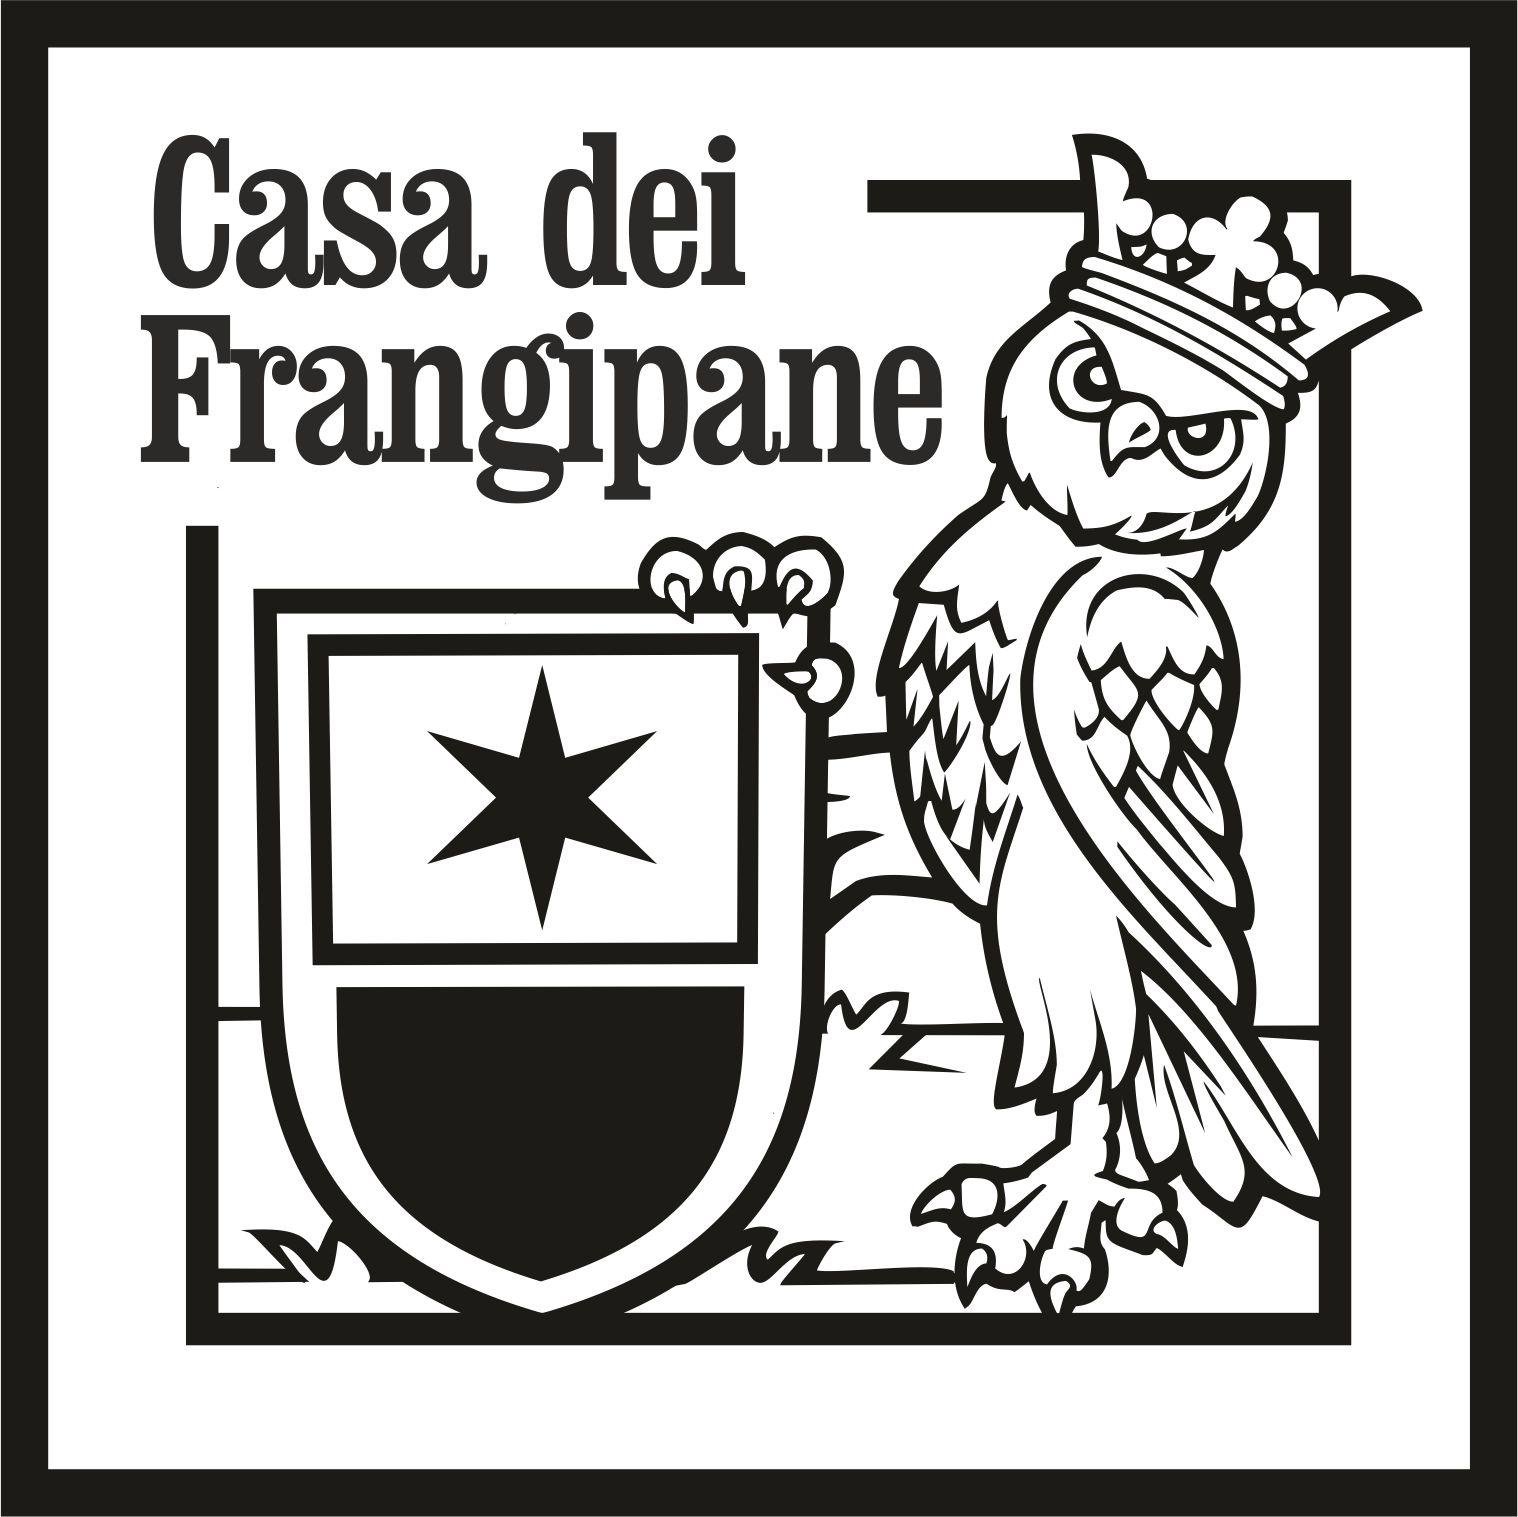 Owl crest logo design.   Logotip s motivom sove.